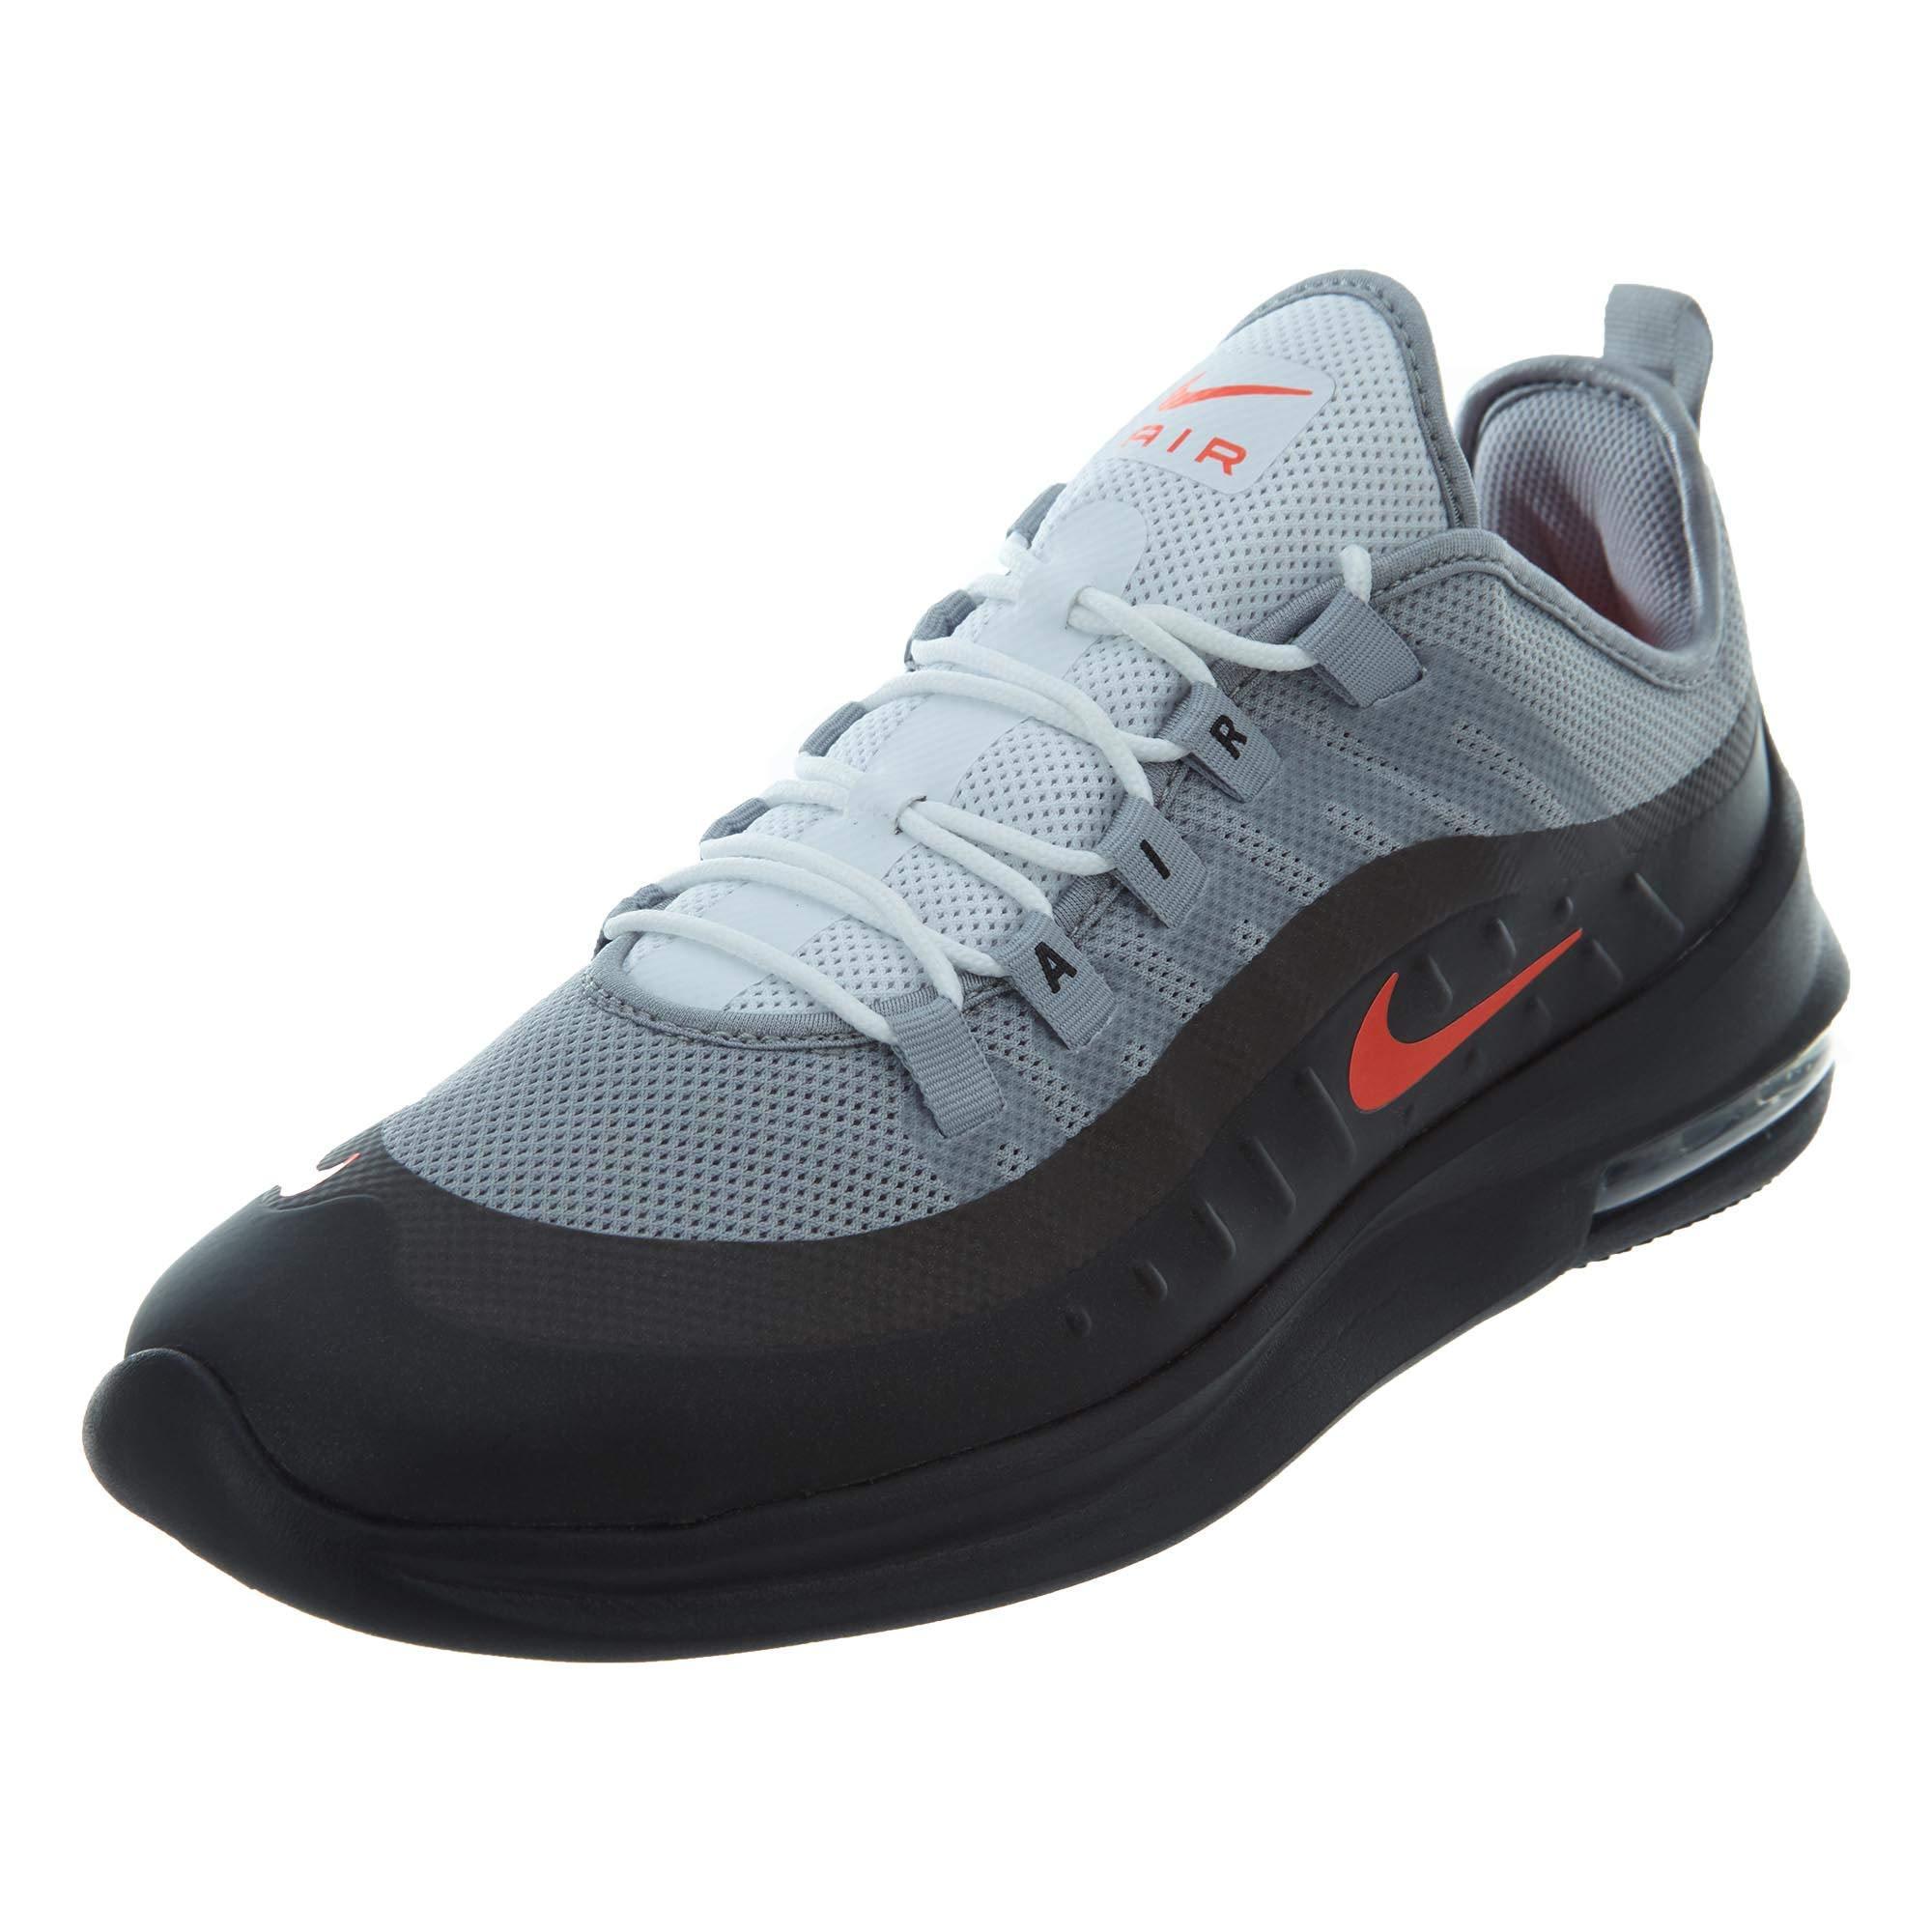 buy good online retailer cheap for discount Nike AA2146-001: мужские Air Max Axis, цвет волчий серый/общий ...